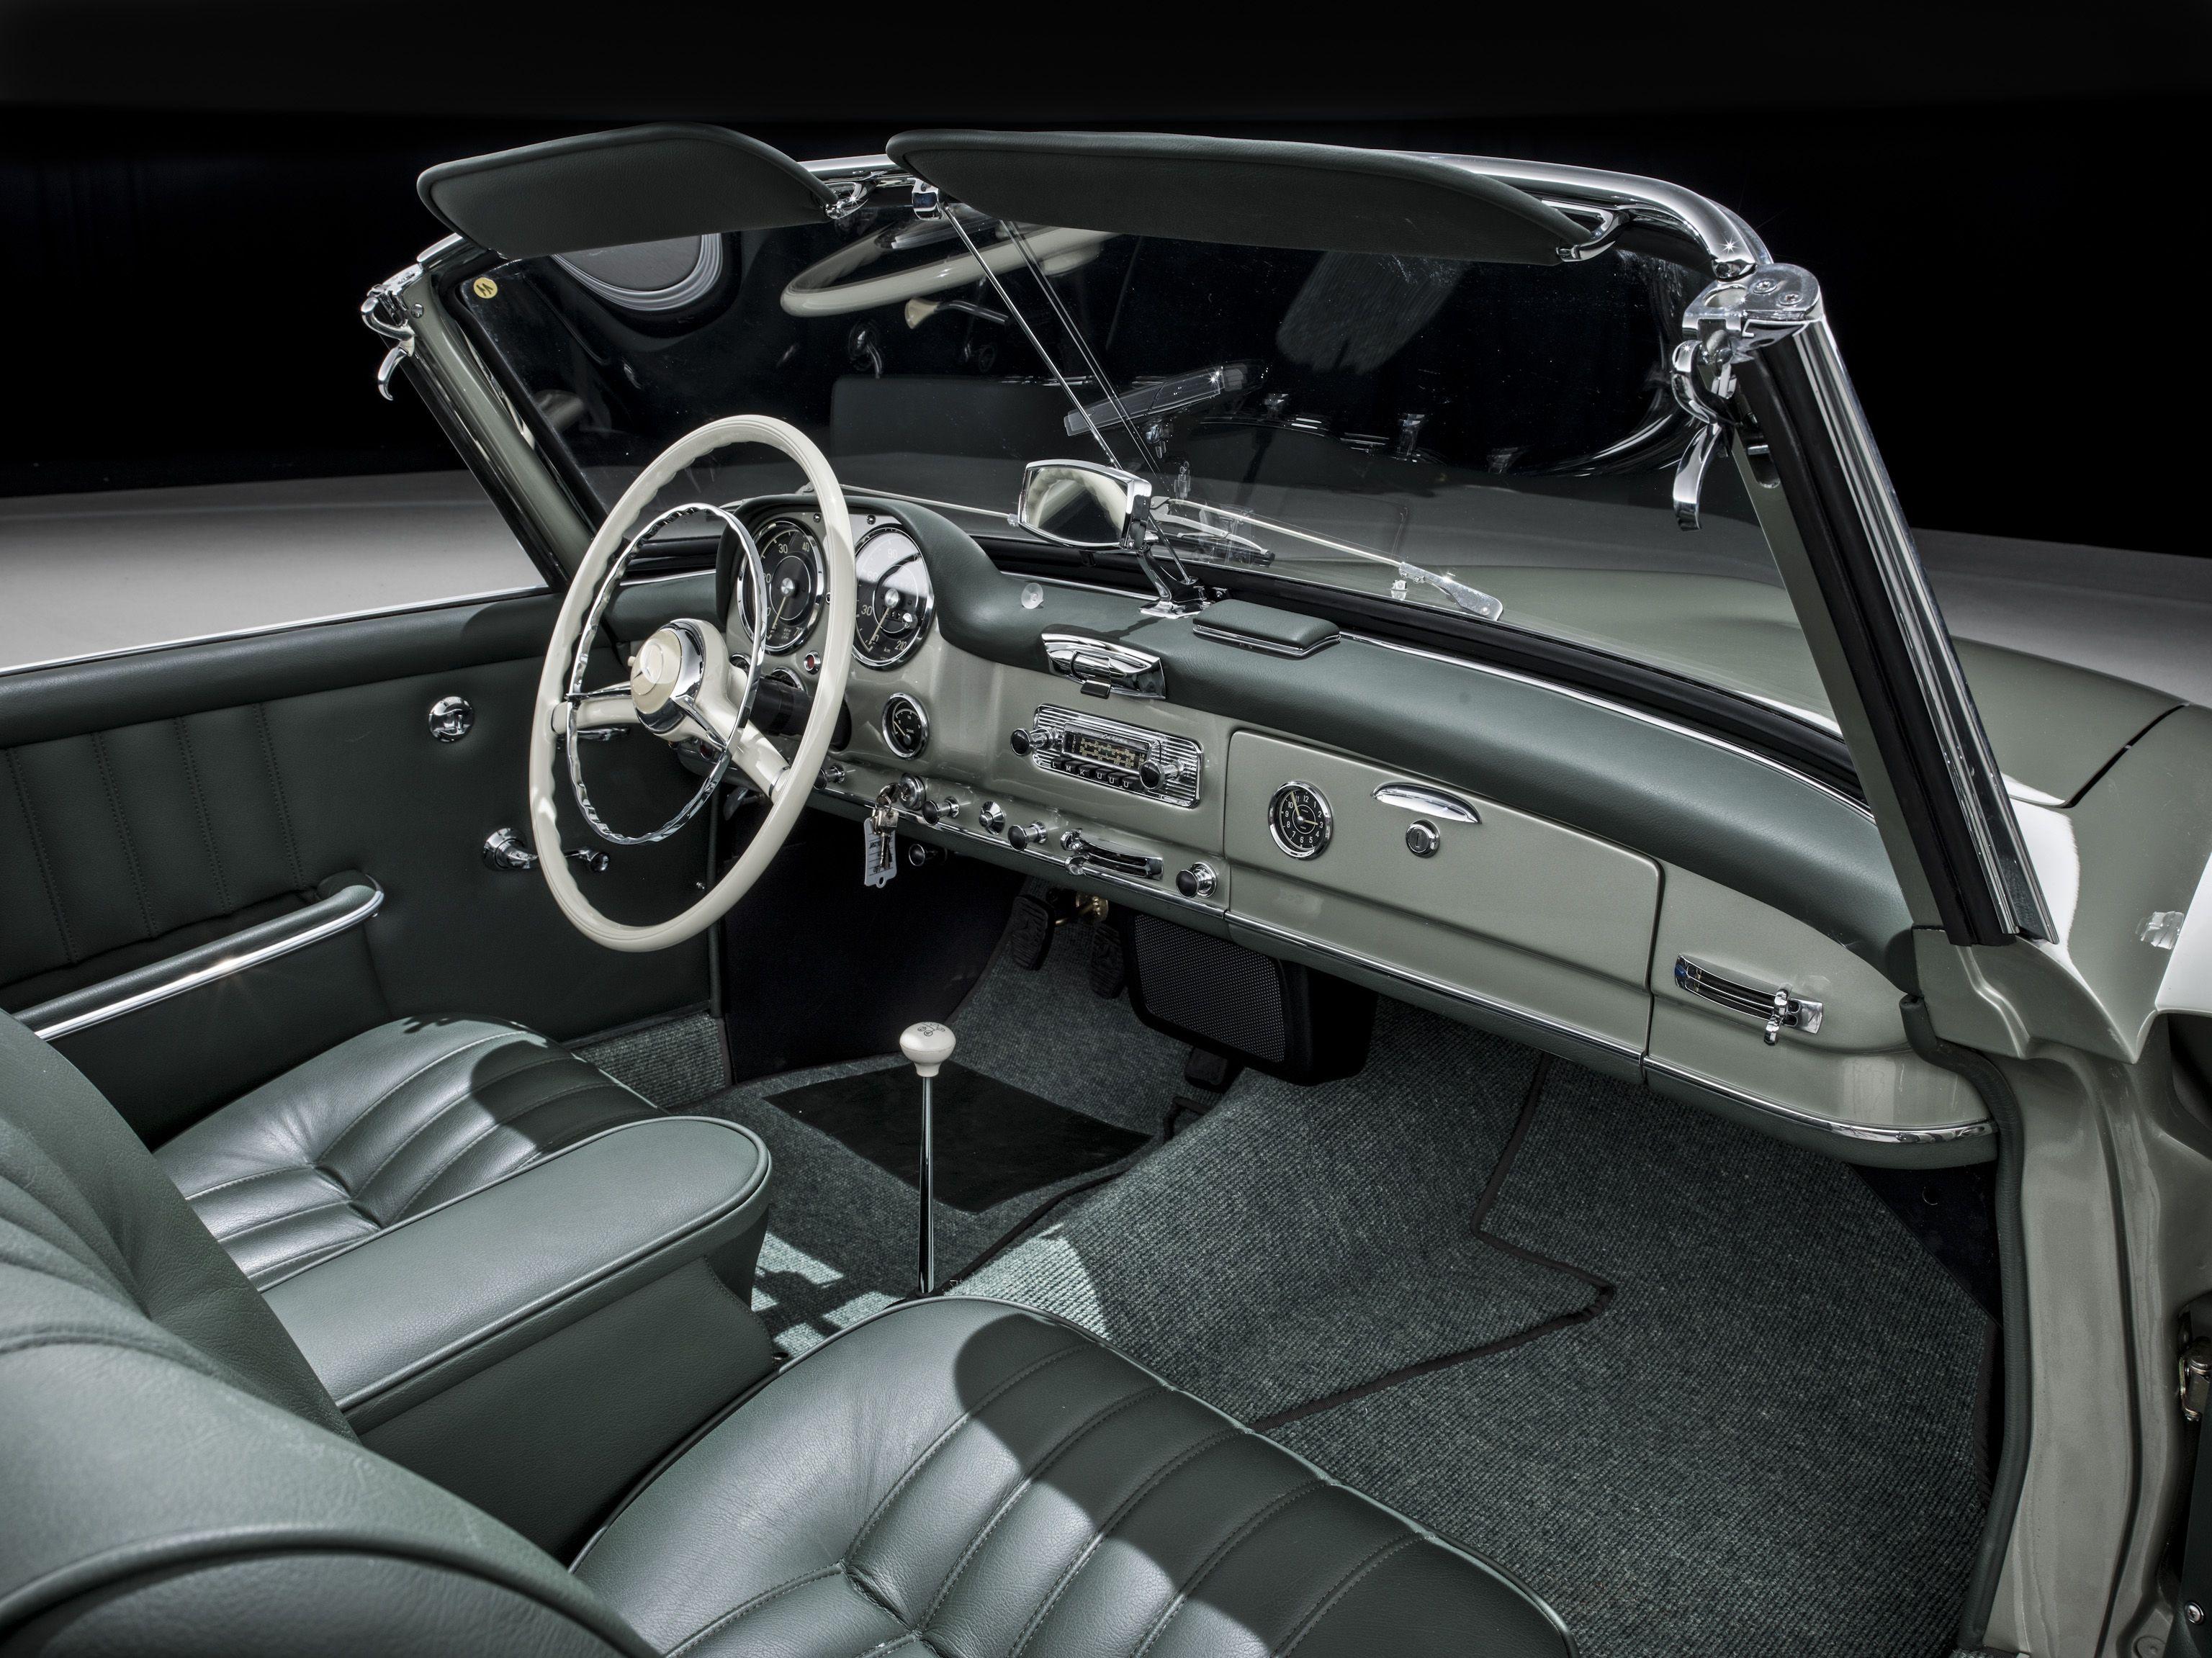 Mercedes Benz 190 SL innenraum armaturenbrett | 190 sl colori ... | {Armaturenbrett oldtimer 32}